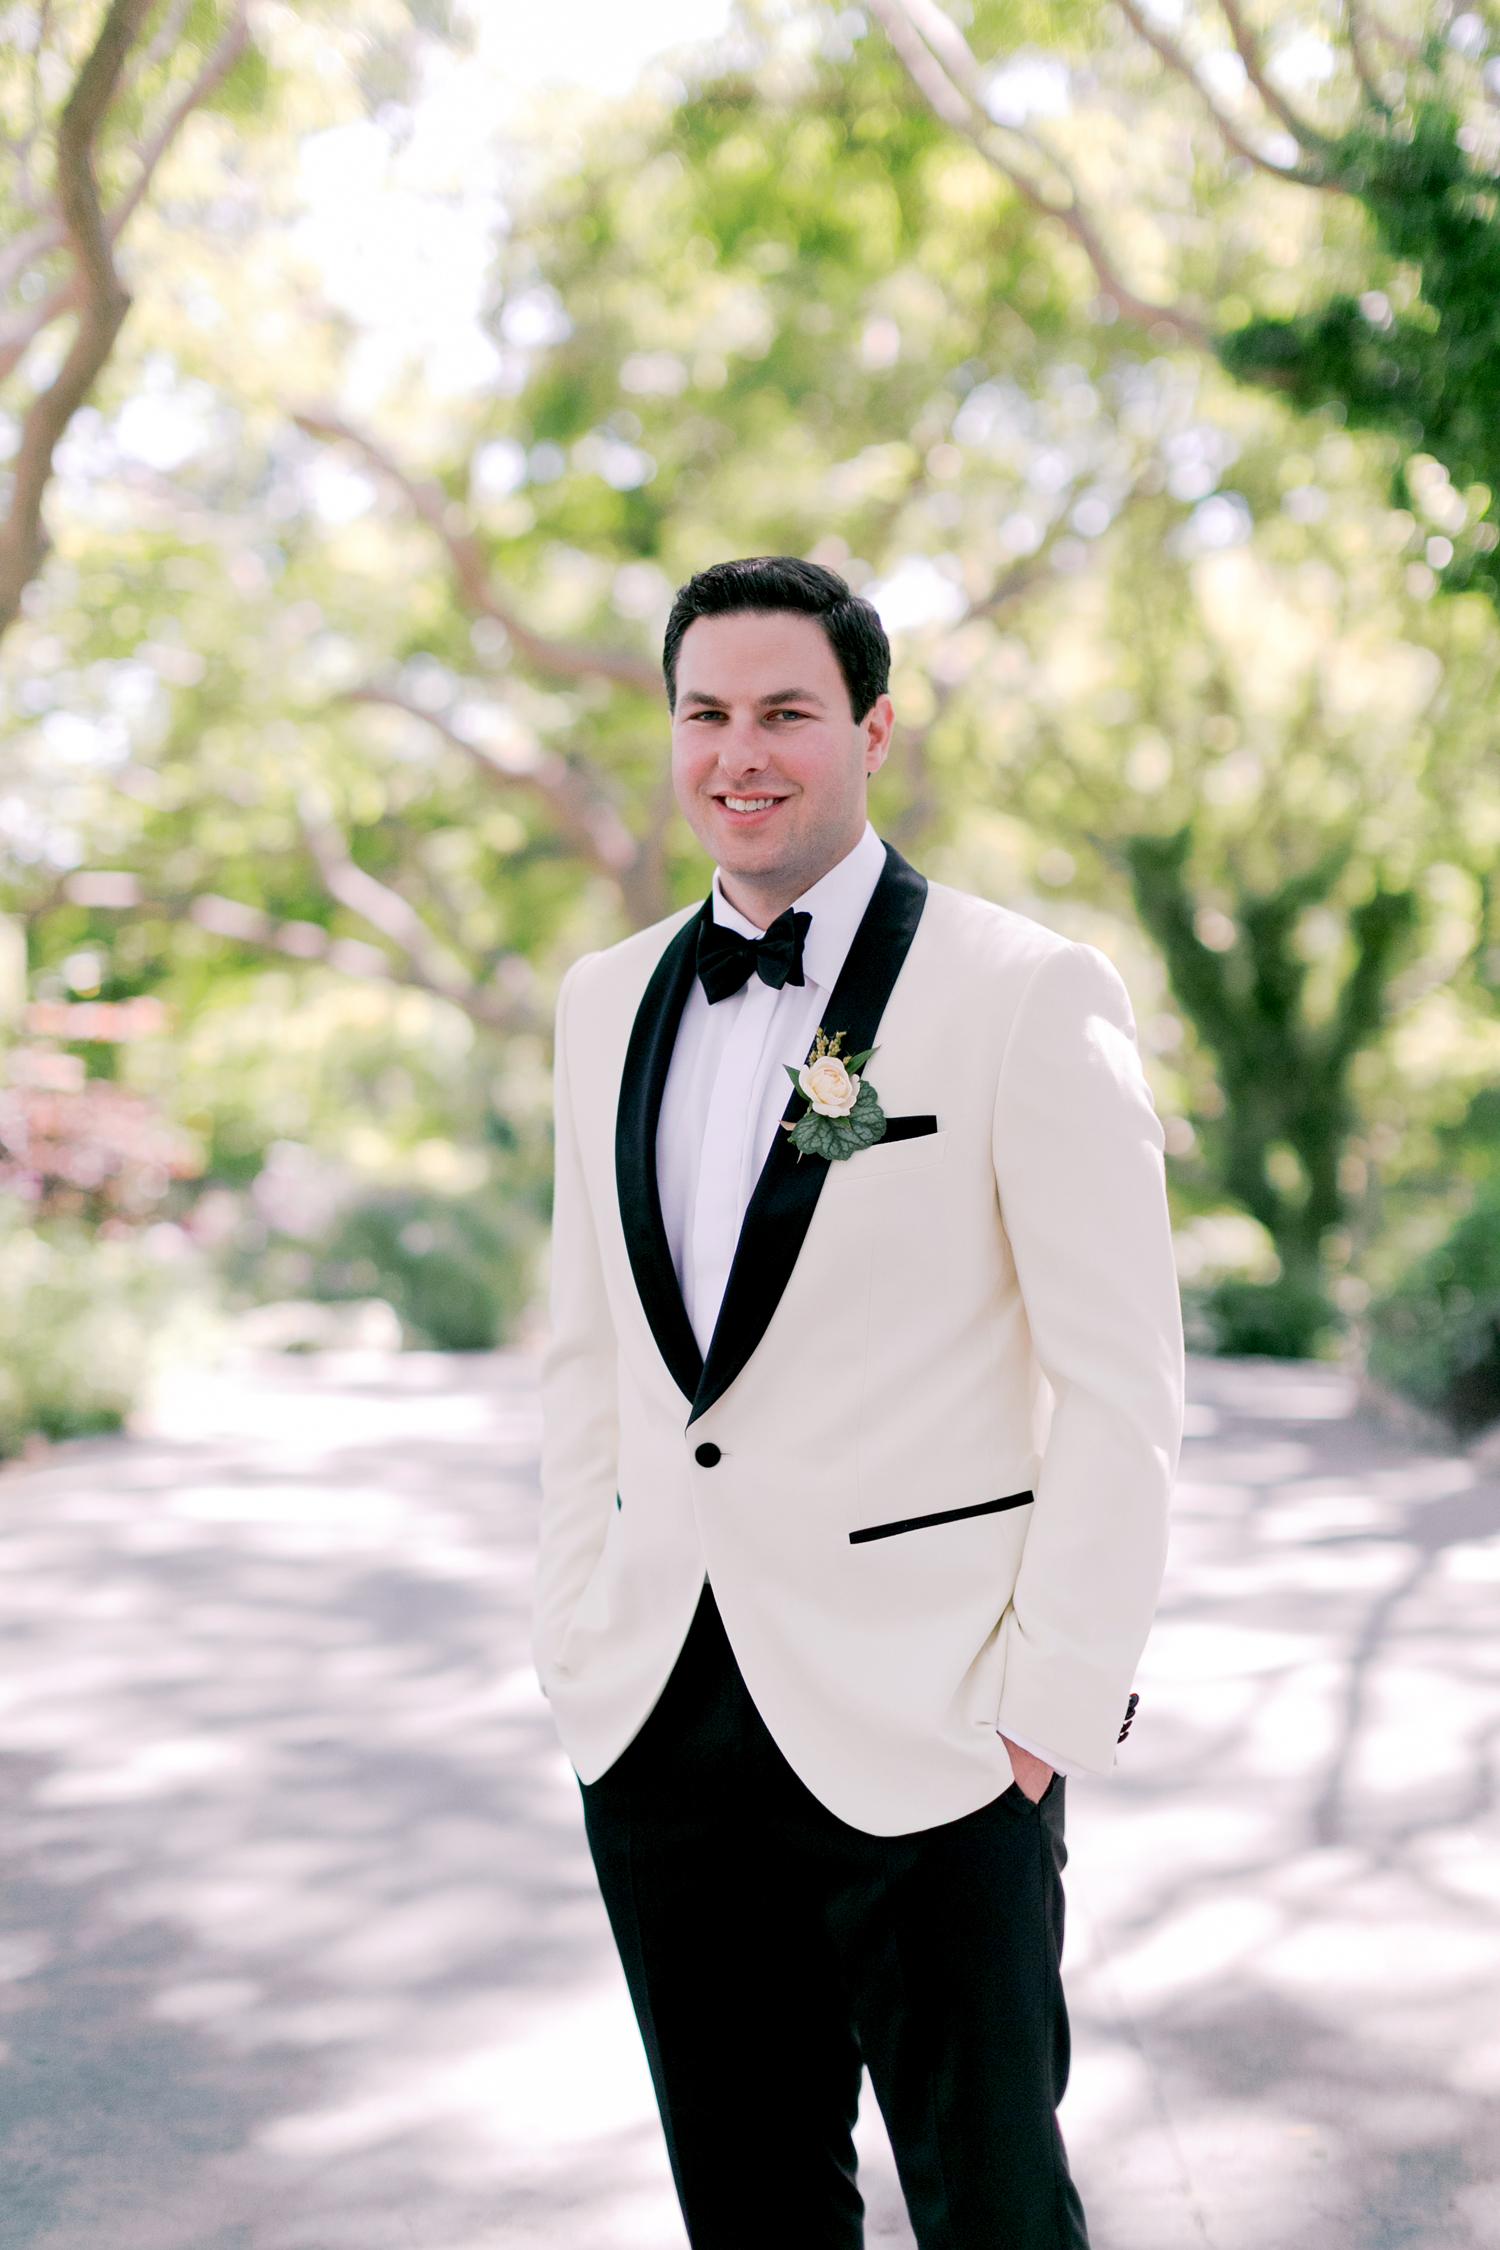 off white jacket black tuxedo pant groom wedding outfit